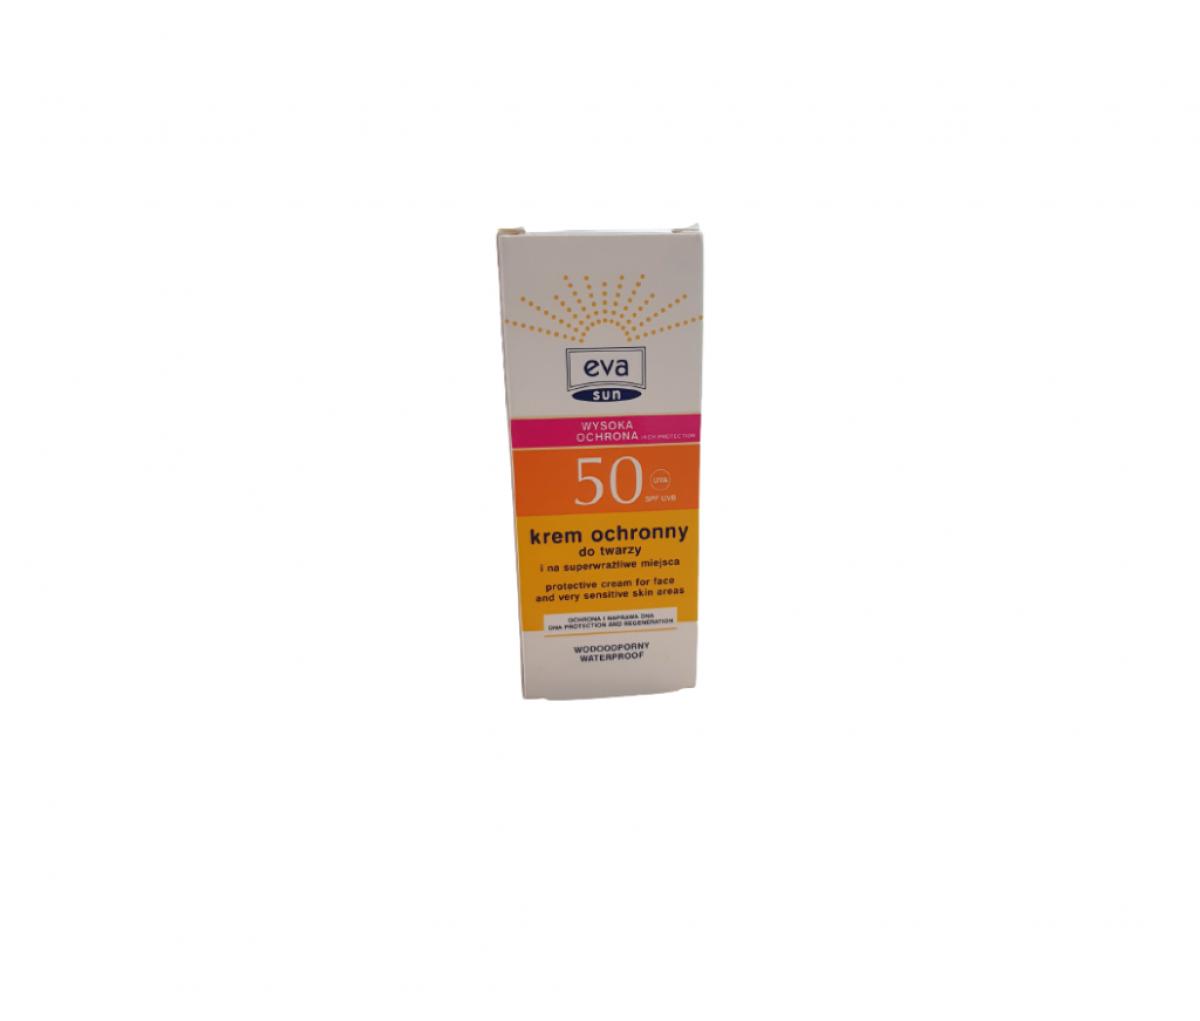 TZMO EVA Sun SPF50 Sun Protection Cream for Sensitive Areas 25ml